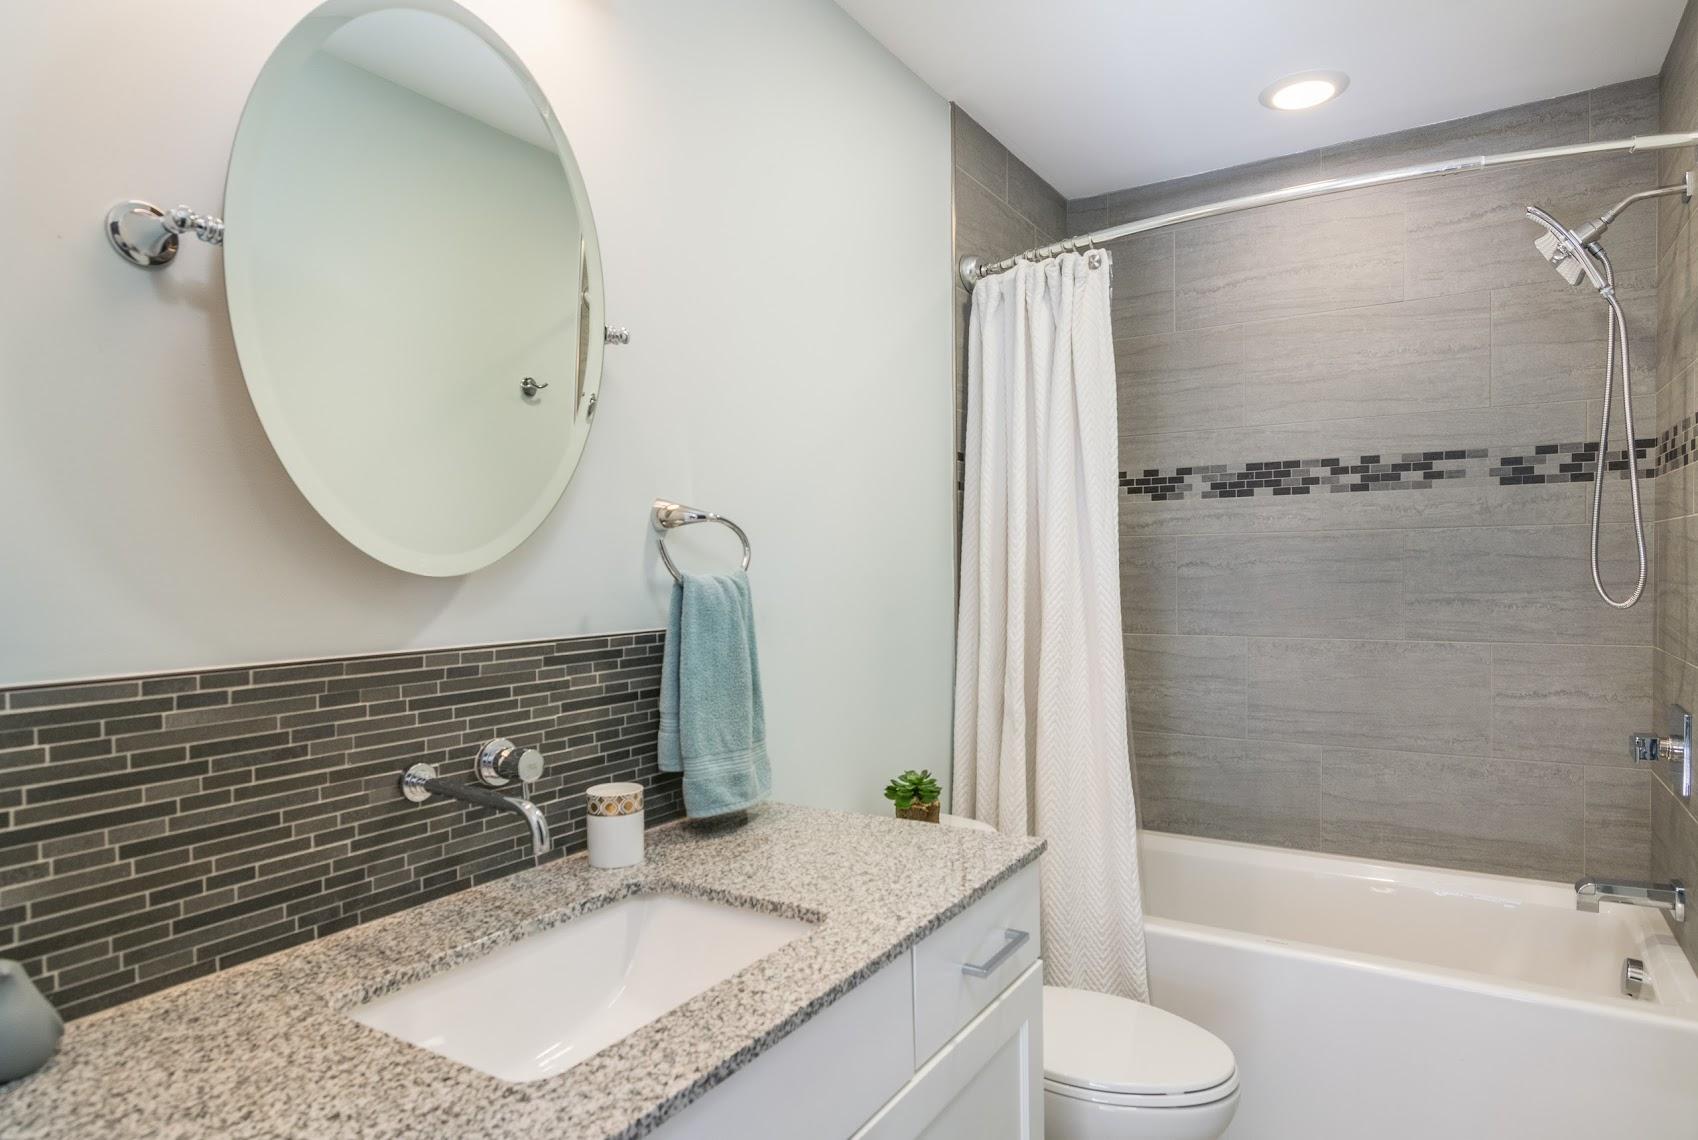 http://www.blackrockus.com/wp-content/uploads/2017/12/Freeman-Woods-Bathroom.jpg